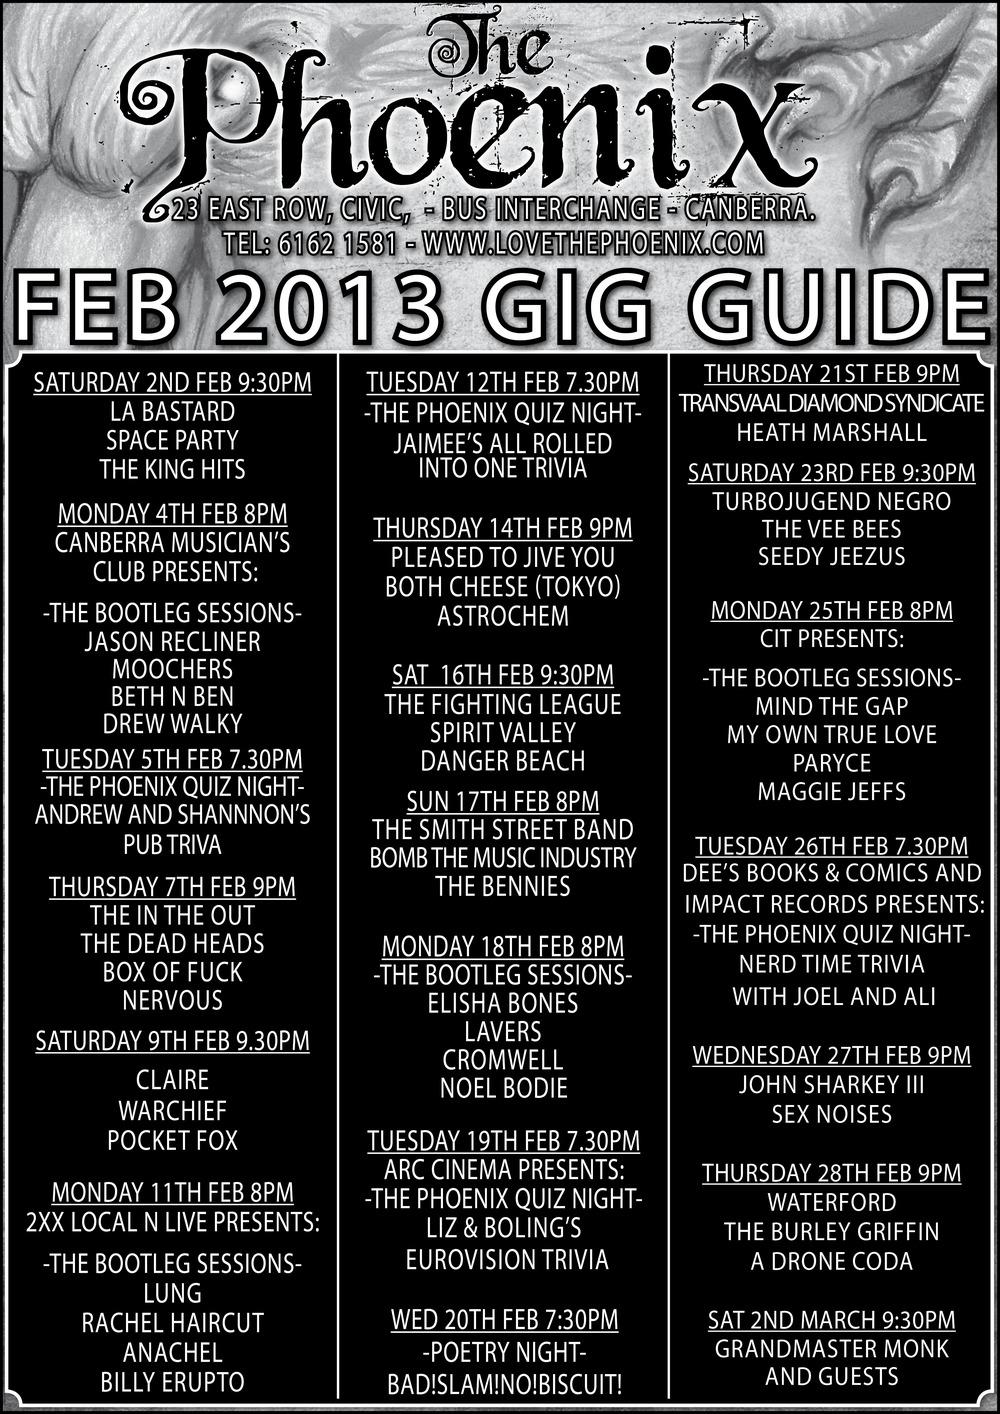 gig-guide_Feb2013.jpg